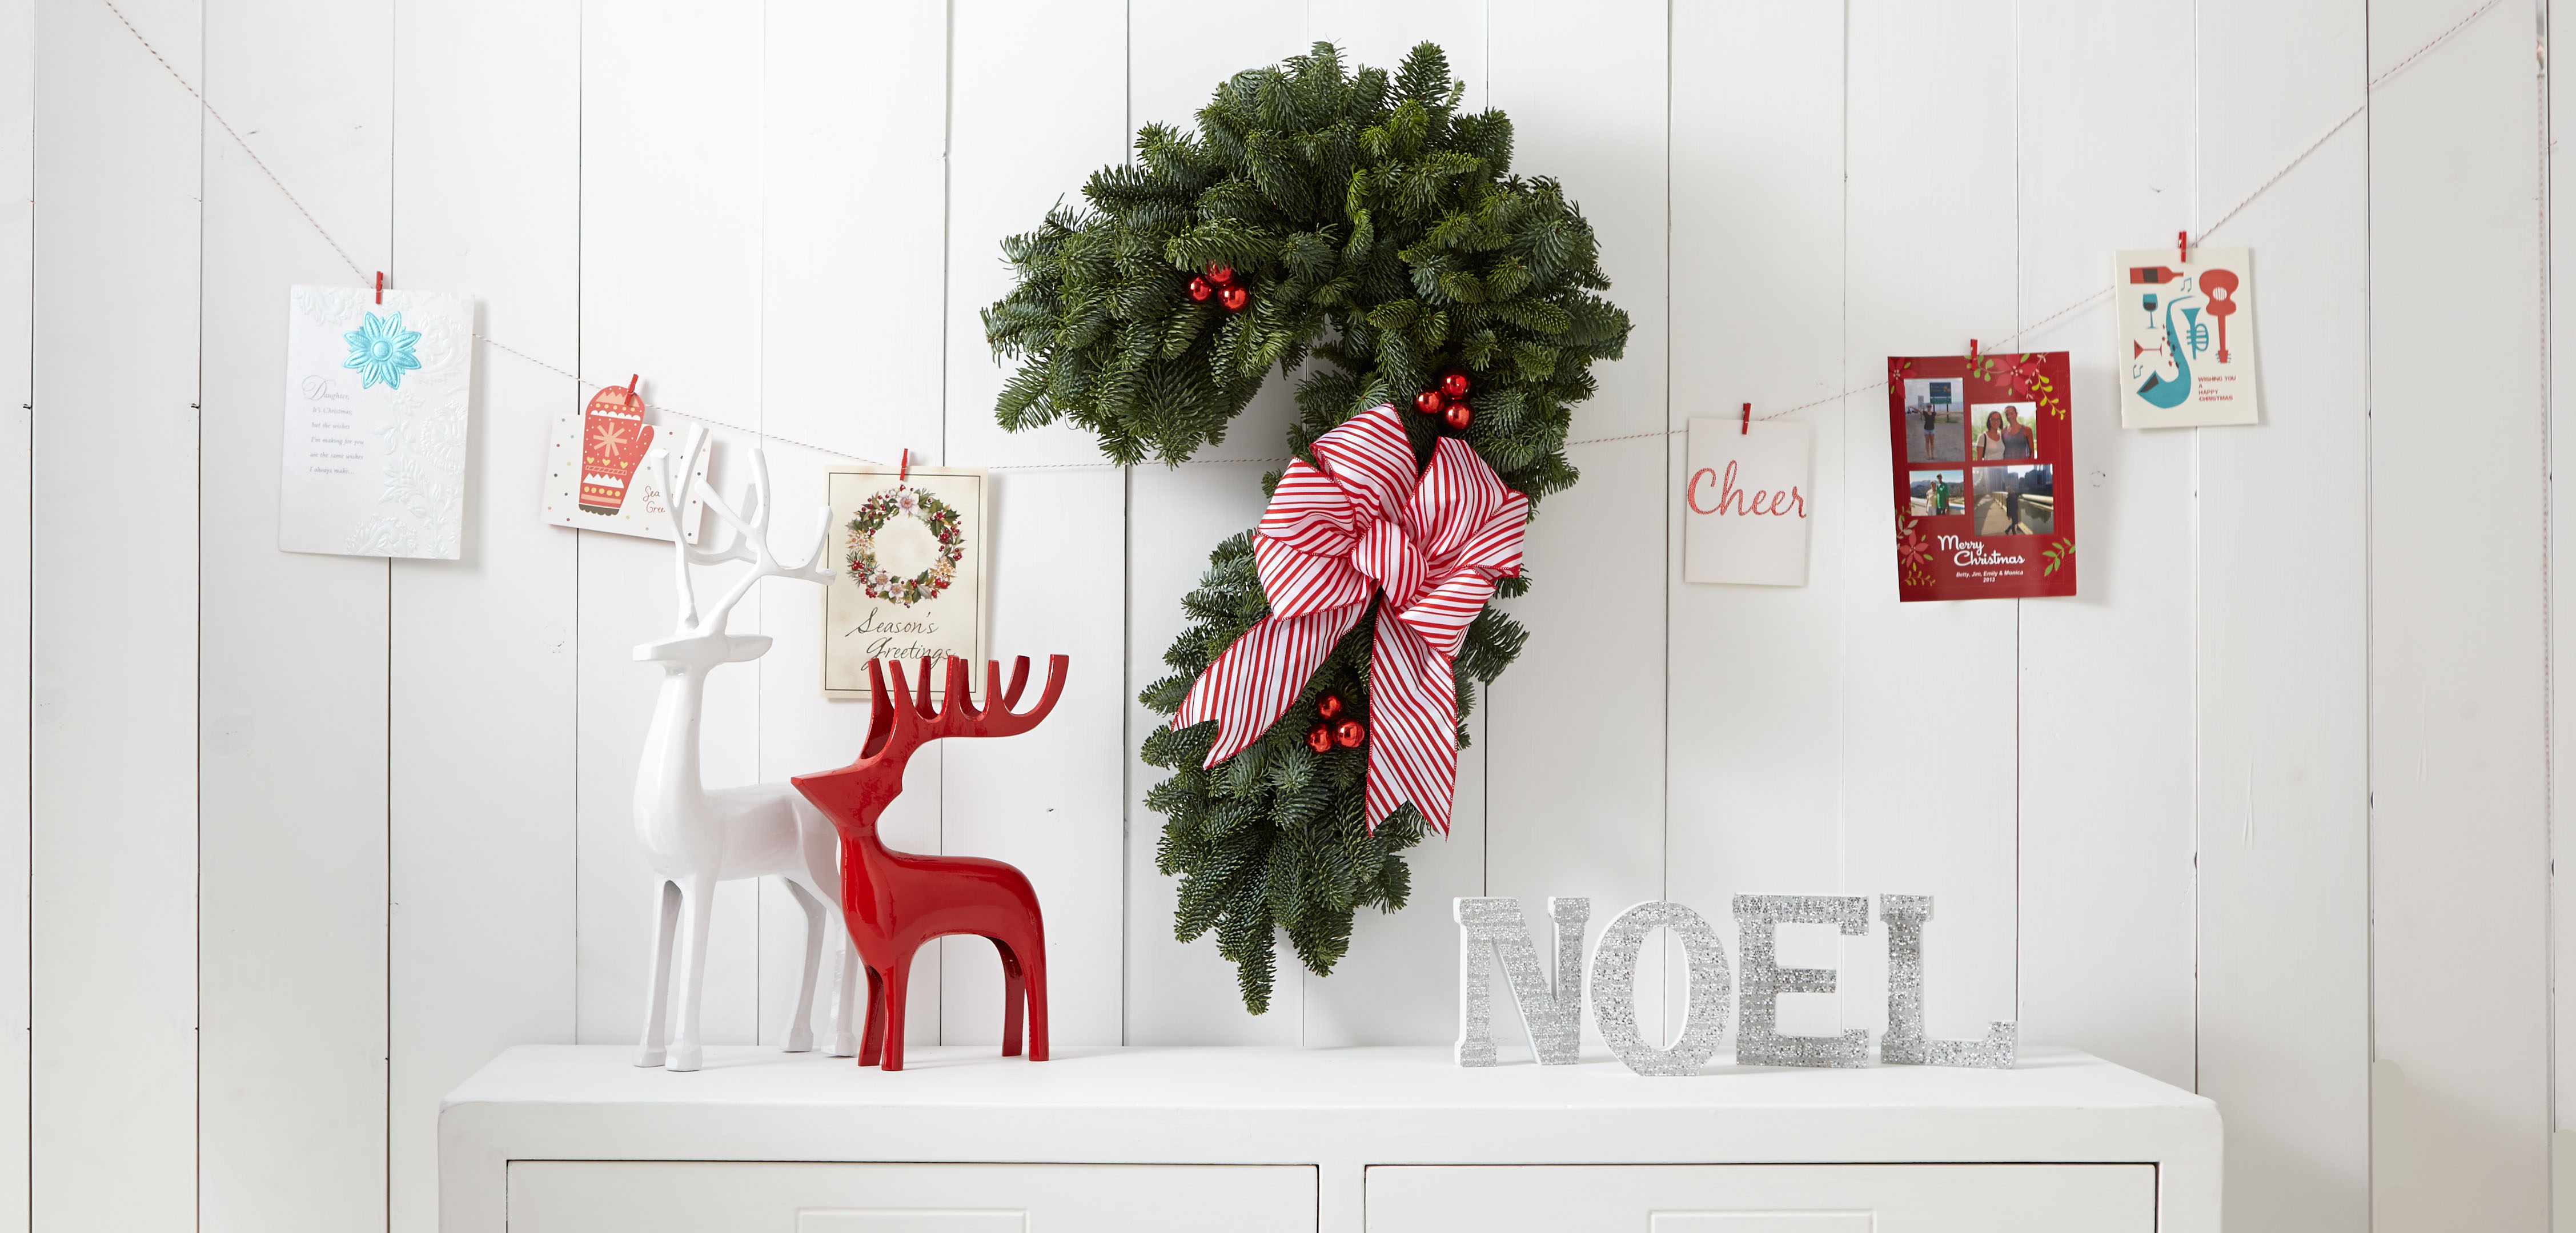 https://www.dotmug.net/wp-content/uploads/2015/12/Christmas.jpg